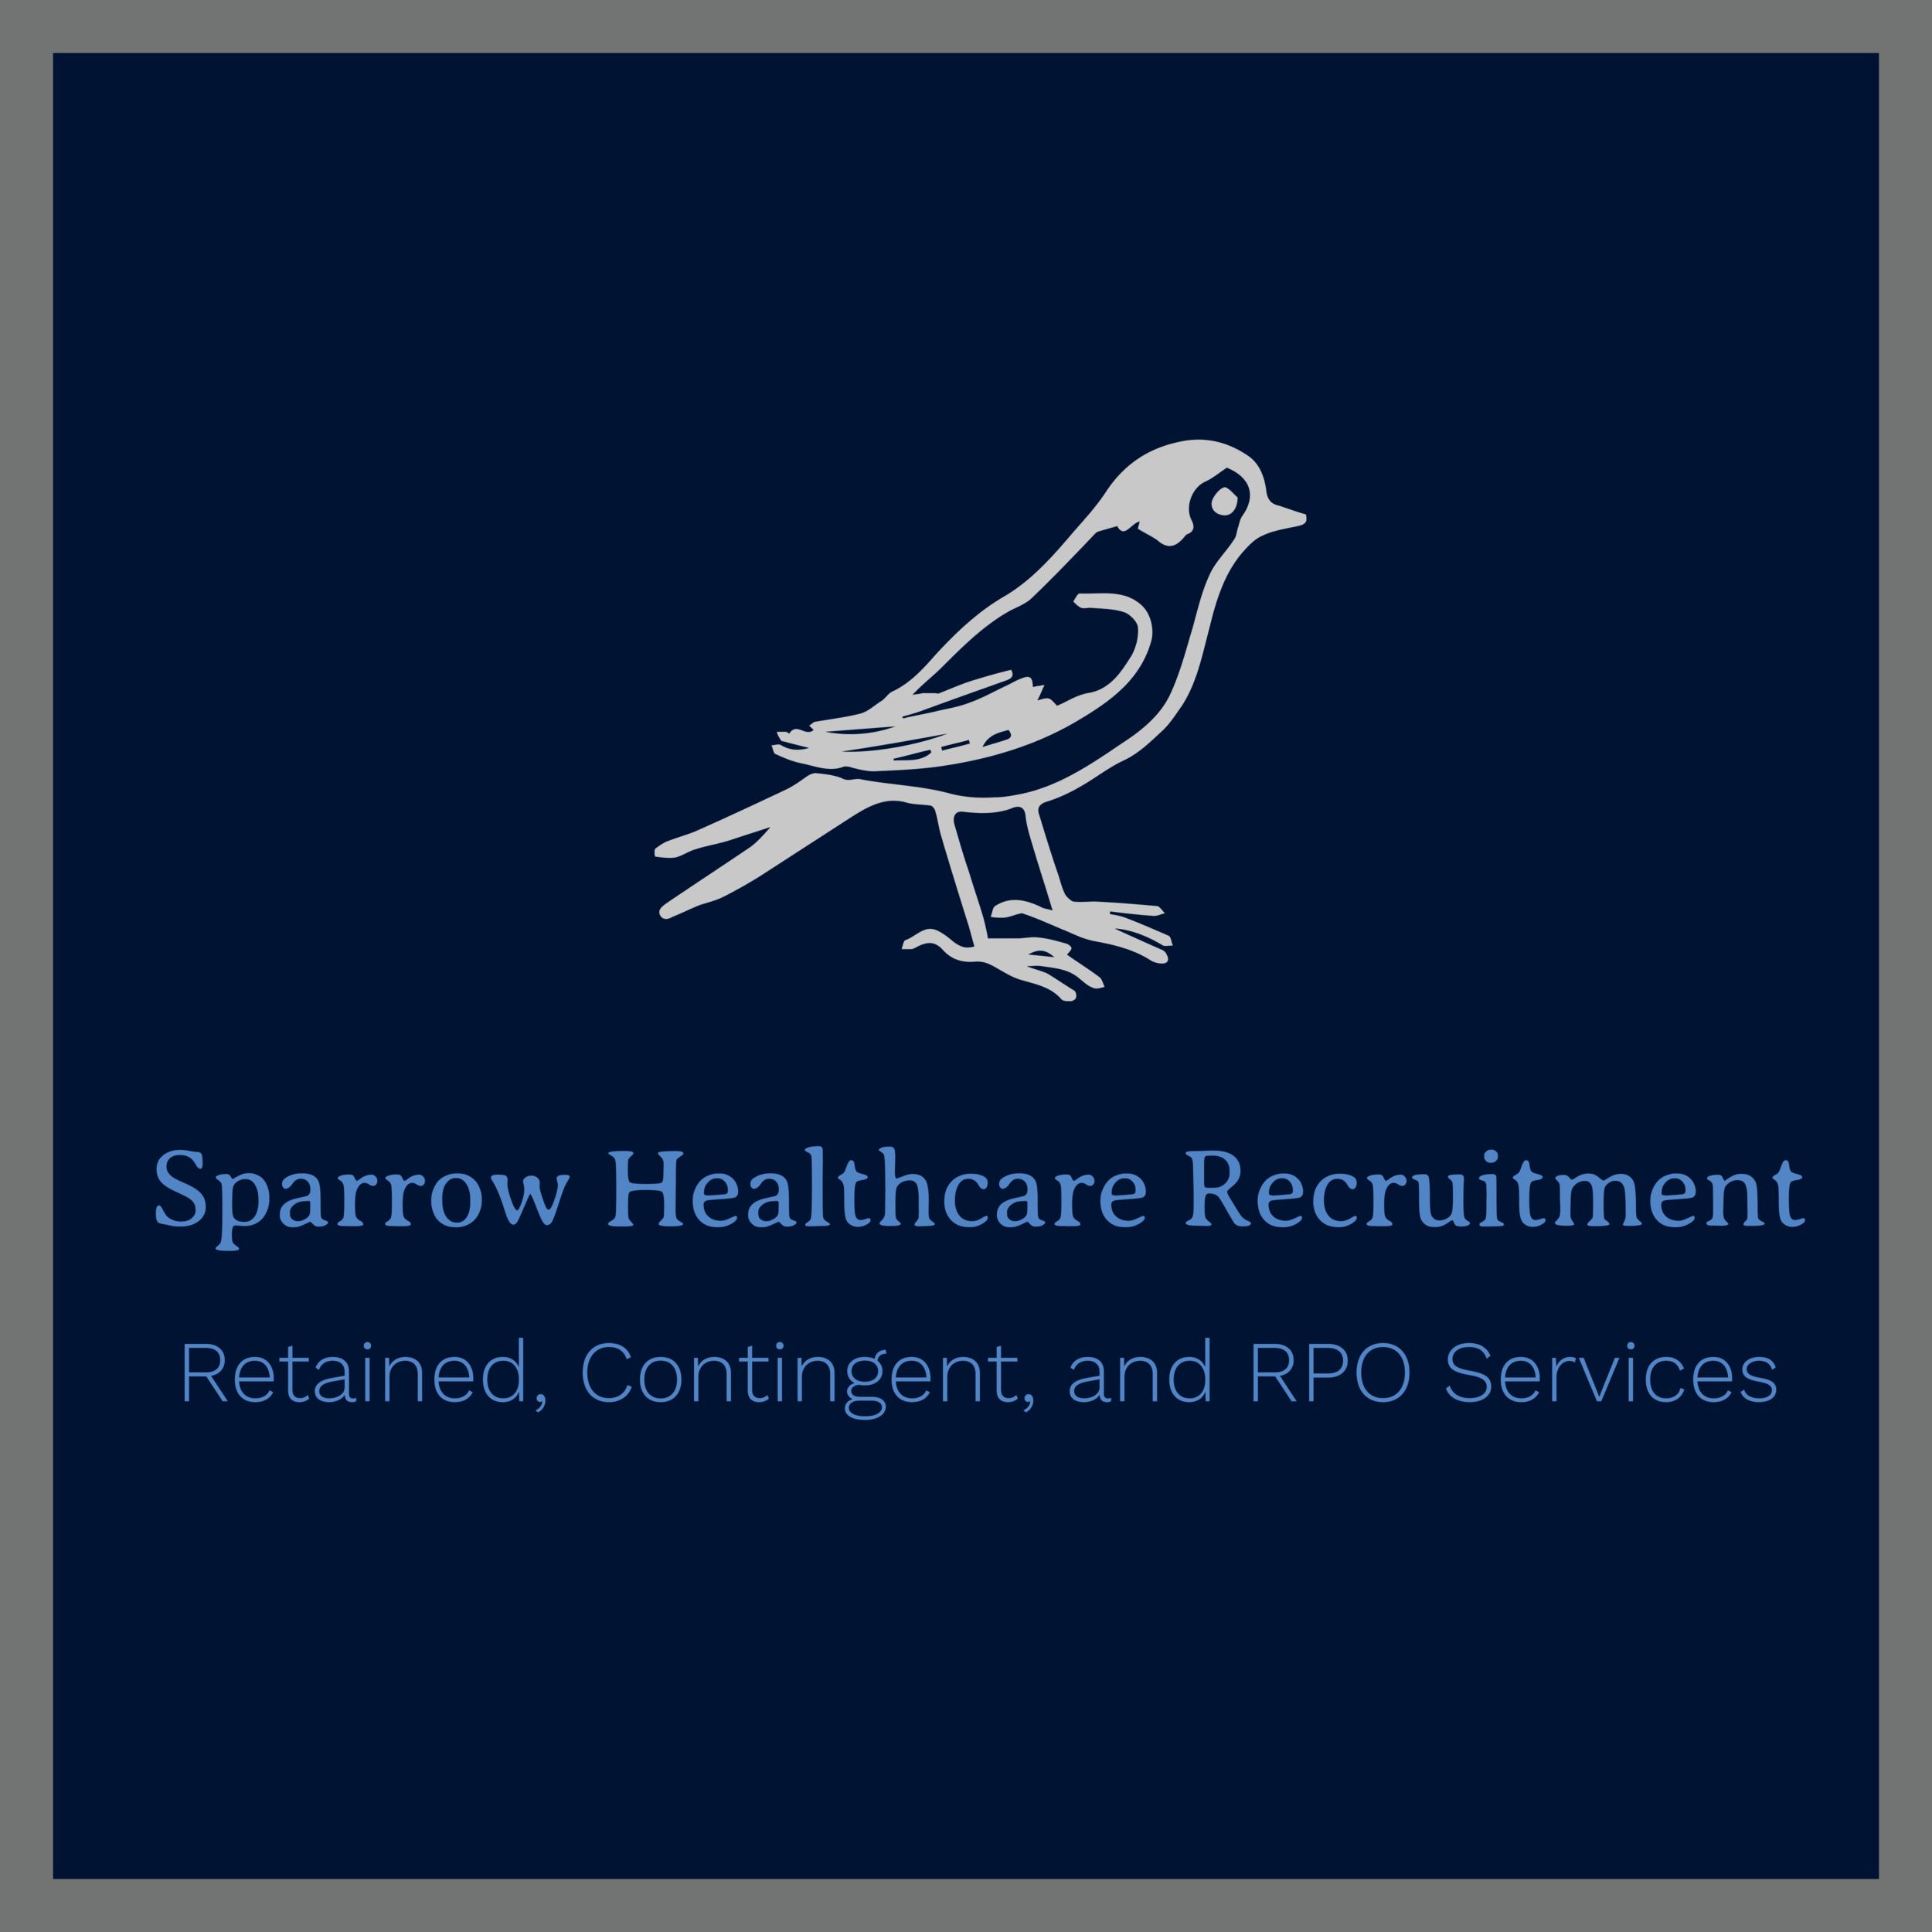 Sparrow Healthcare Recruitment Logo.png